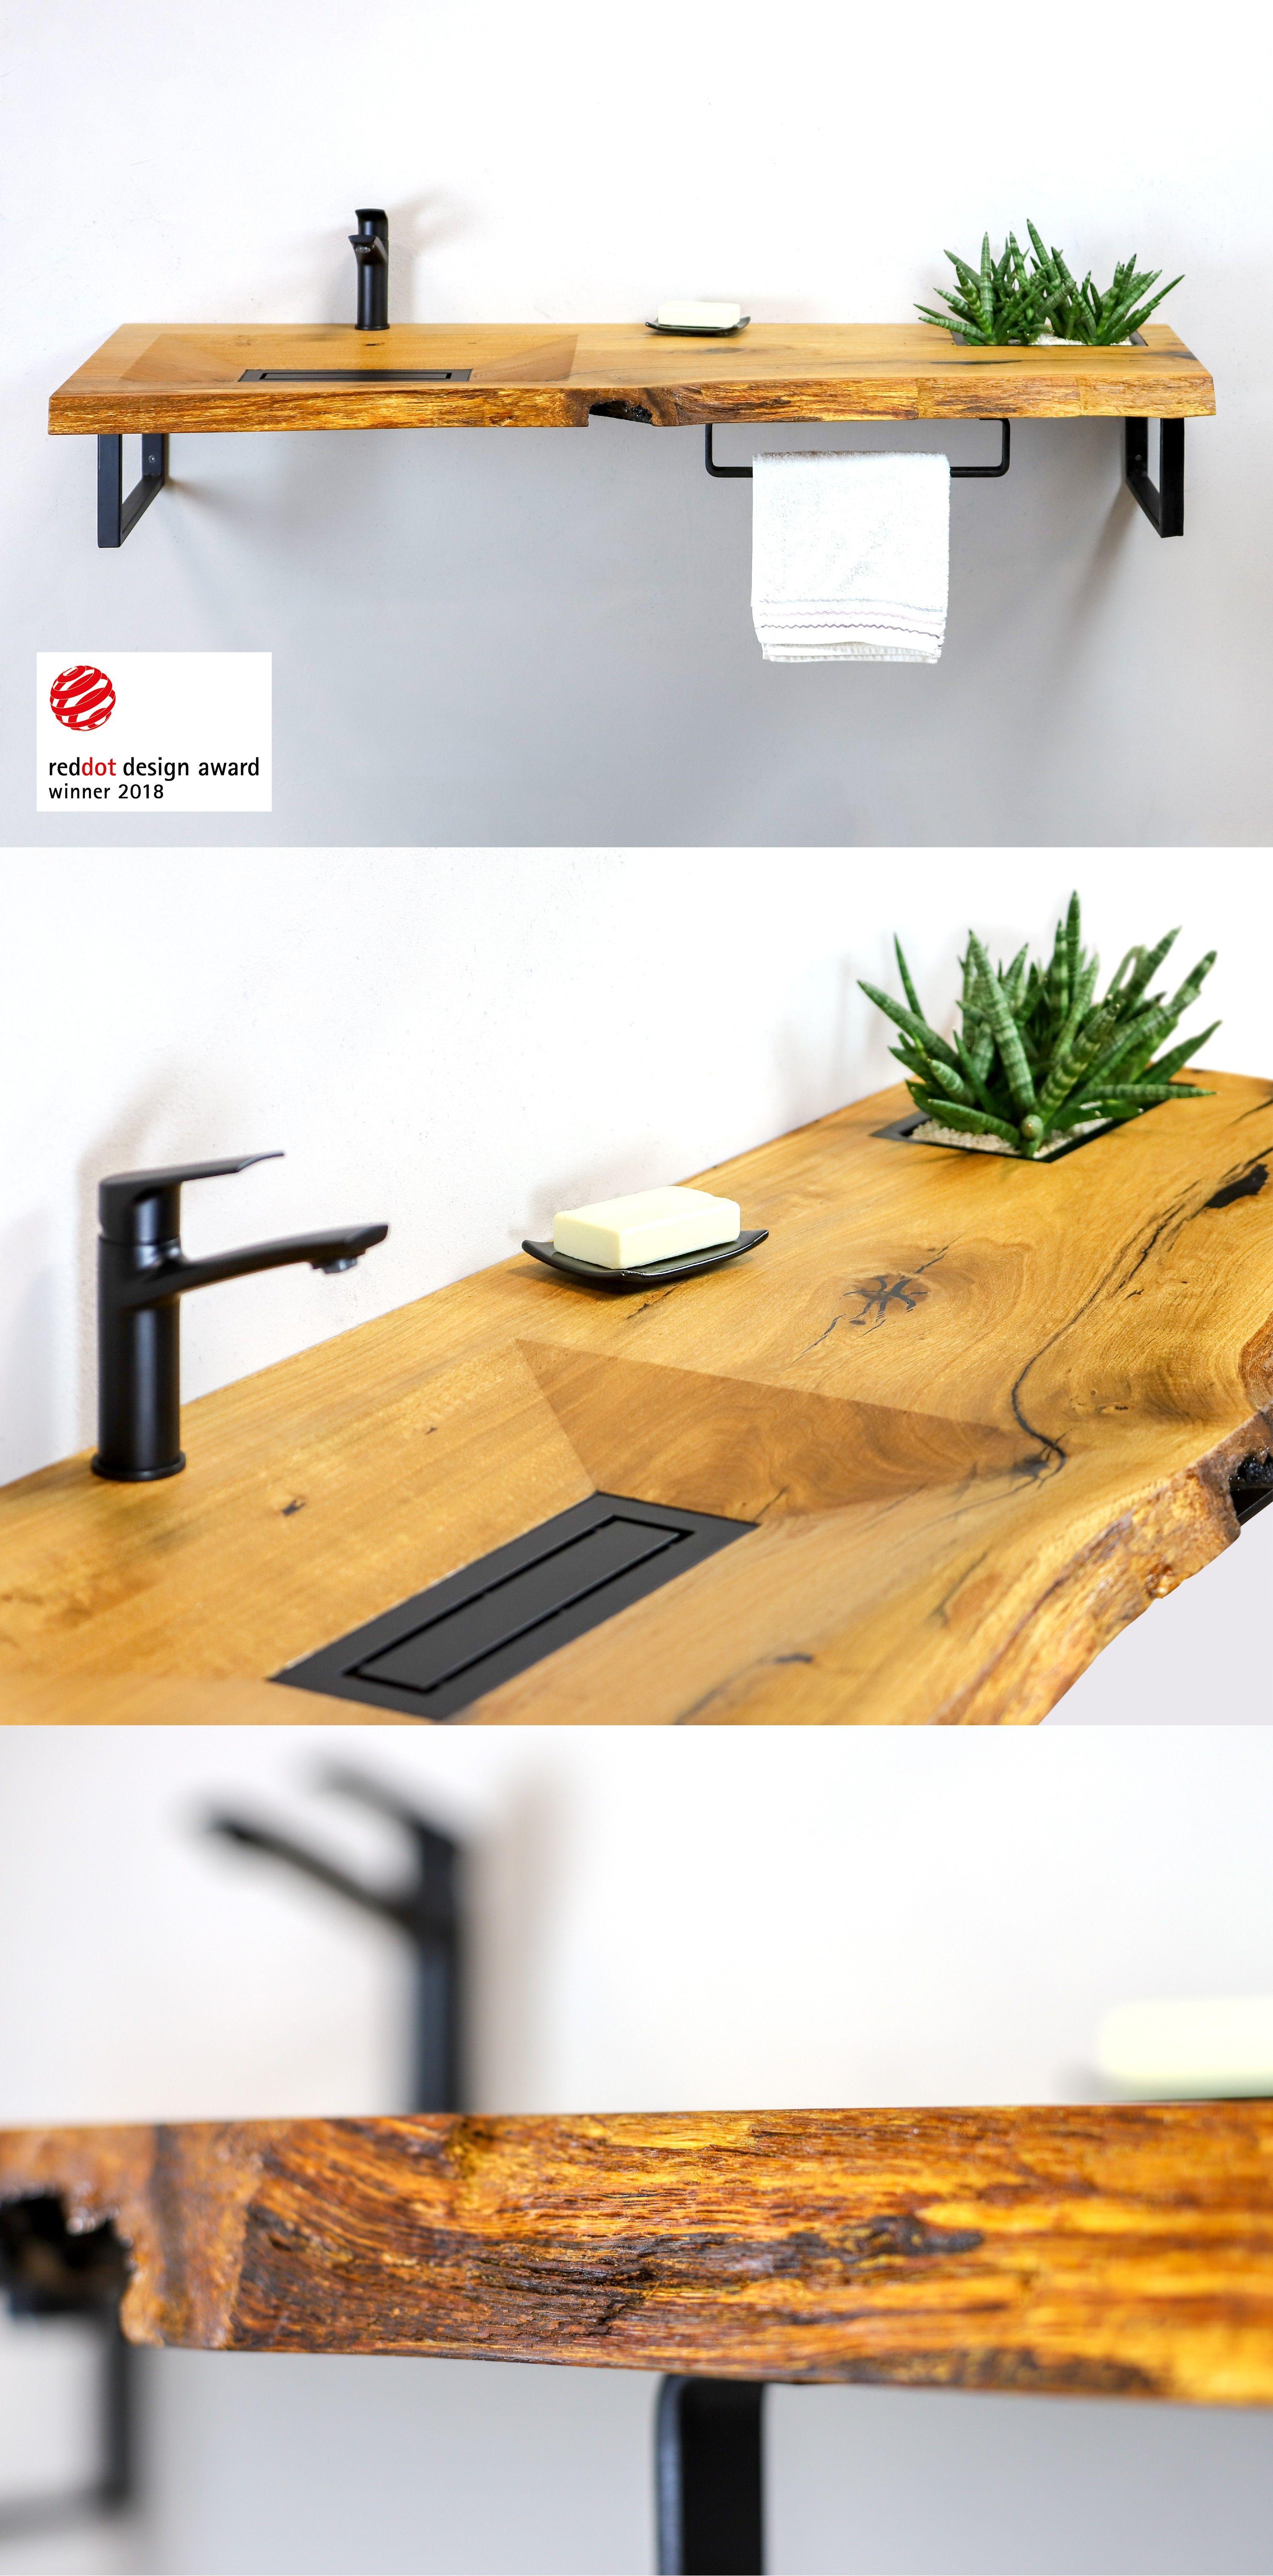 Reddot Pramiertes Design Holzwaschbecken Wood Basin Cone Invi Holz